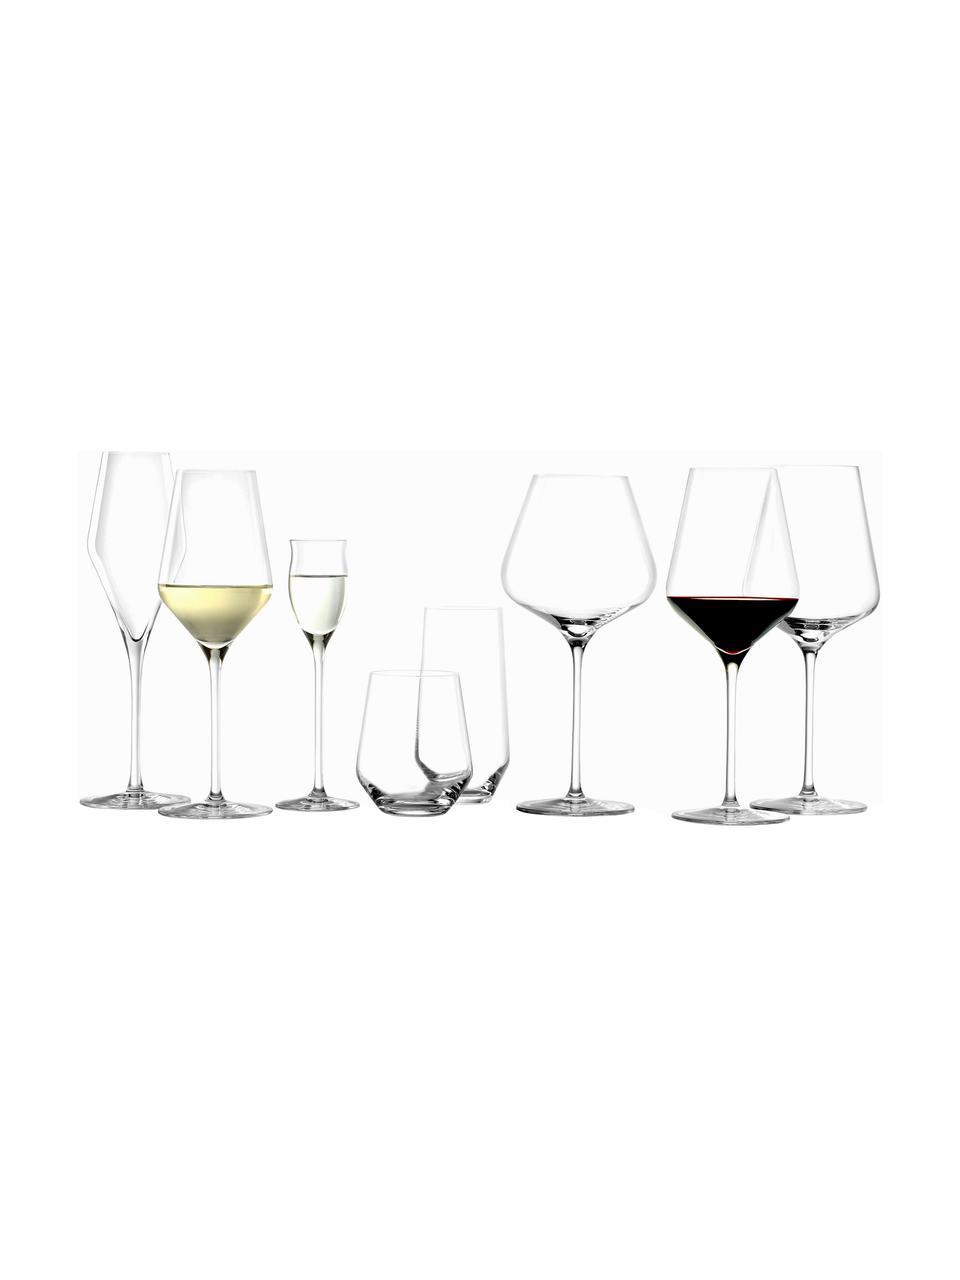 Kristall-Likörgläser Quatrophil, 6 Stück, Kristallglas, Transparent, Ø 6 x H 20 cm